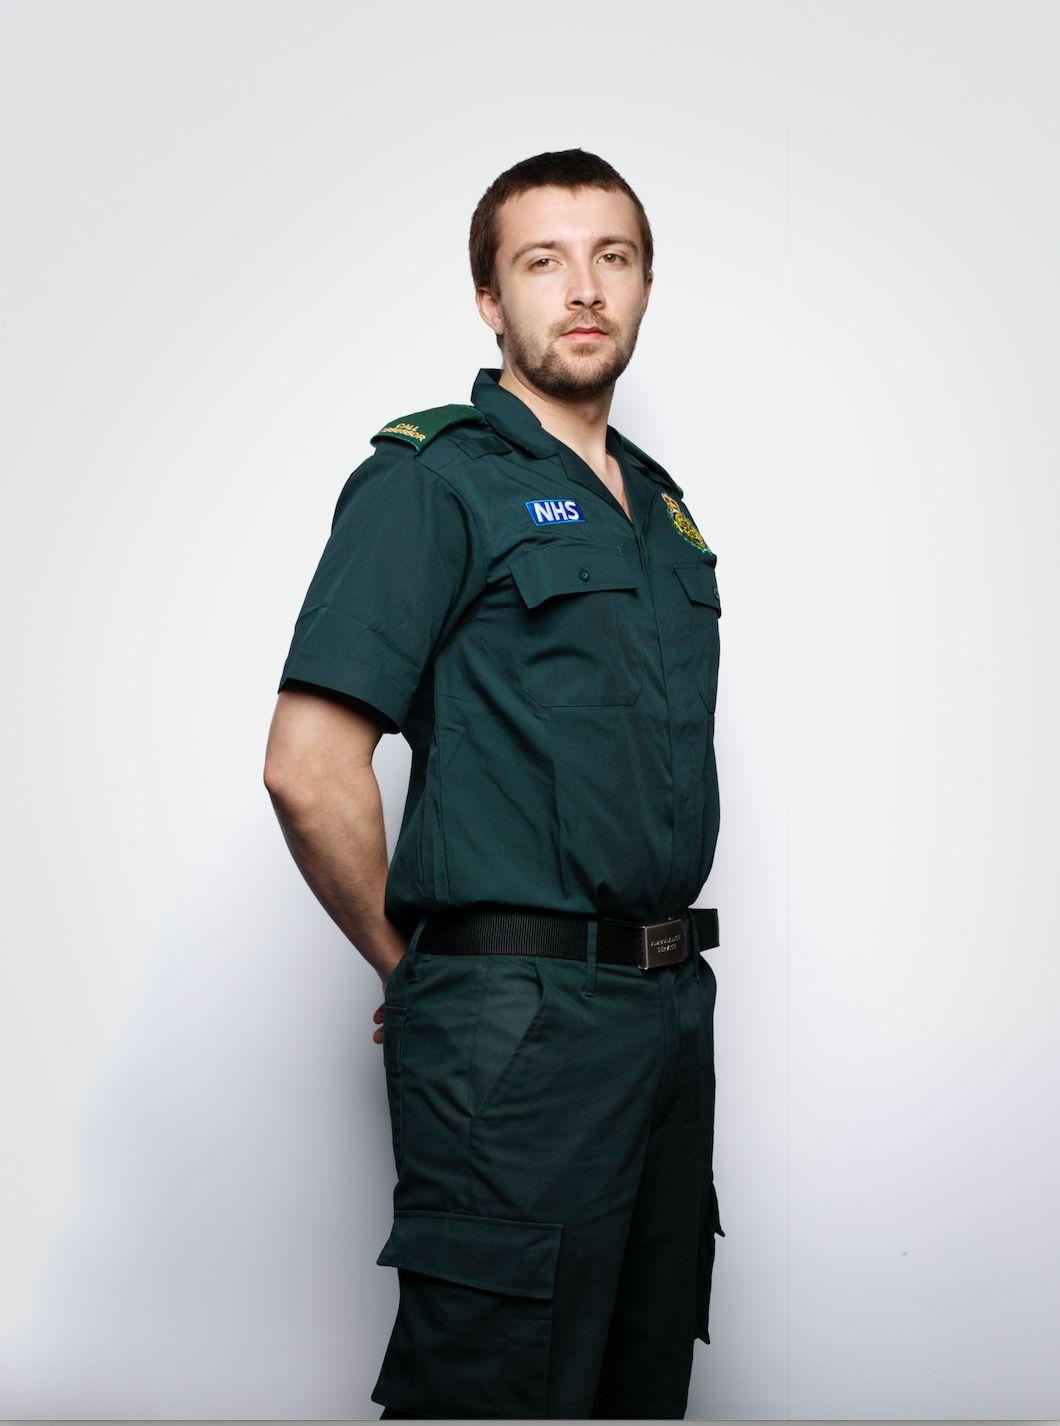 Jack Hannay Manikum, 111 call handler, West Midlands Ambulance Service